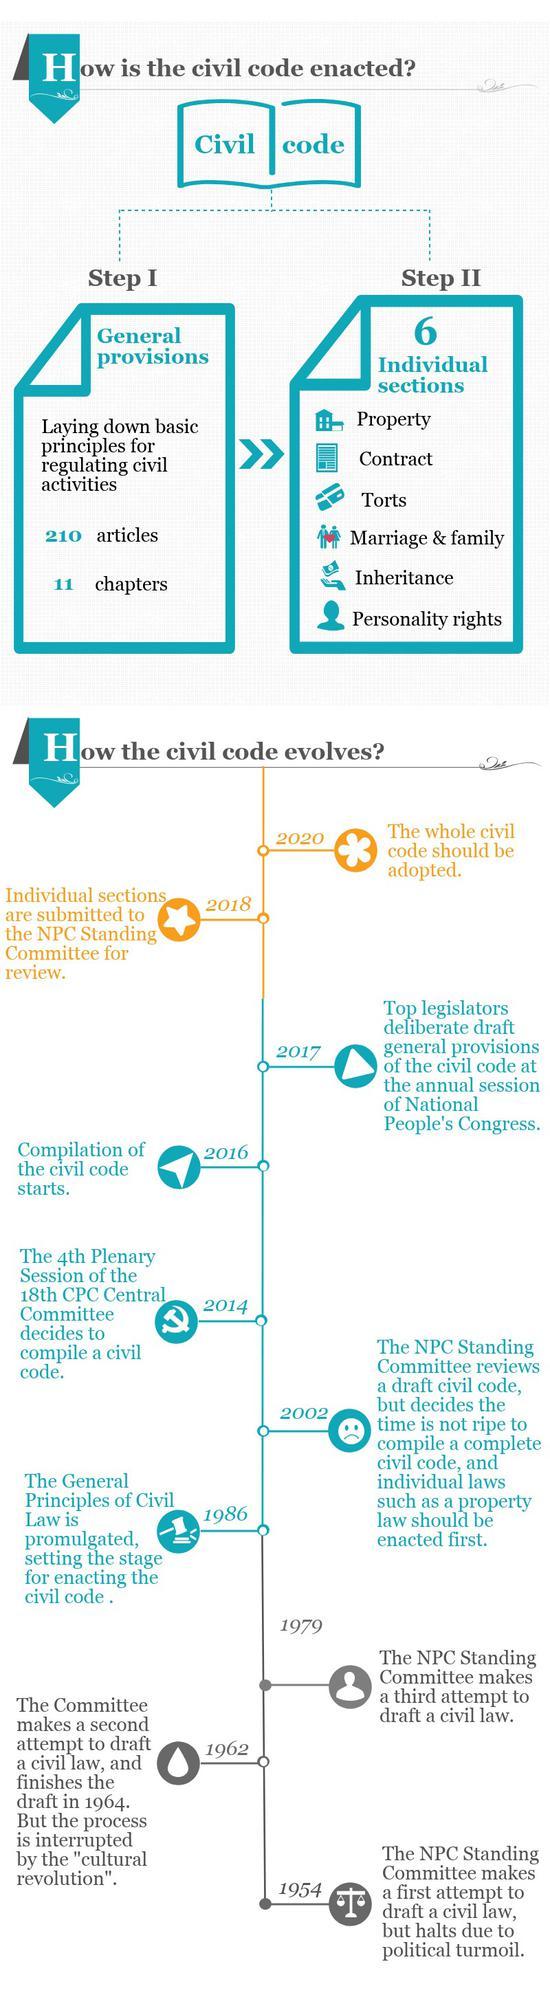 How the civil code evolves?